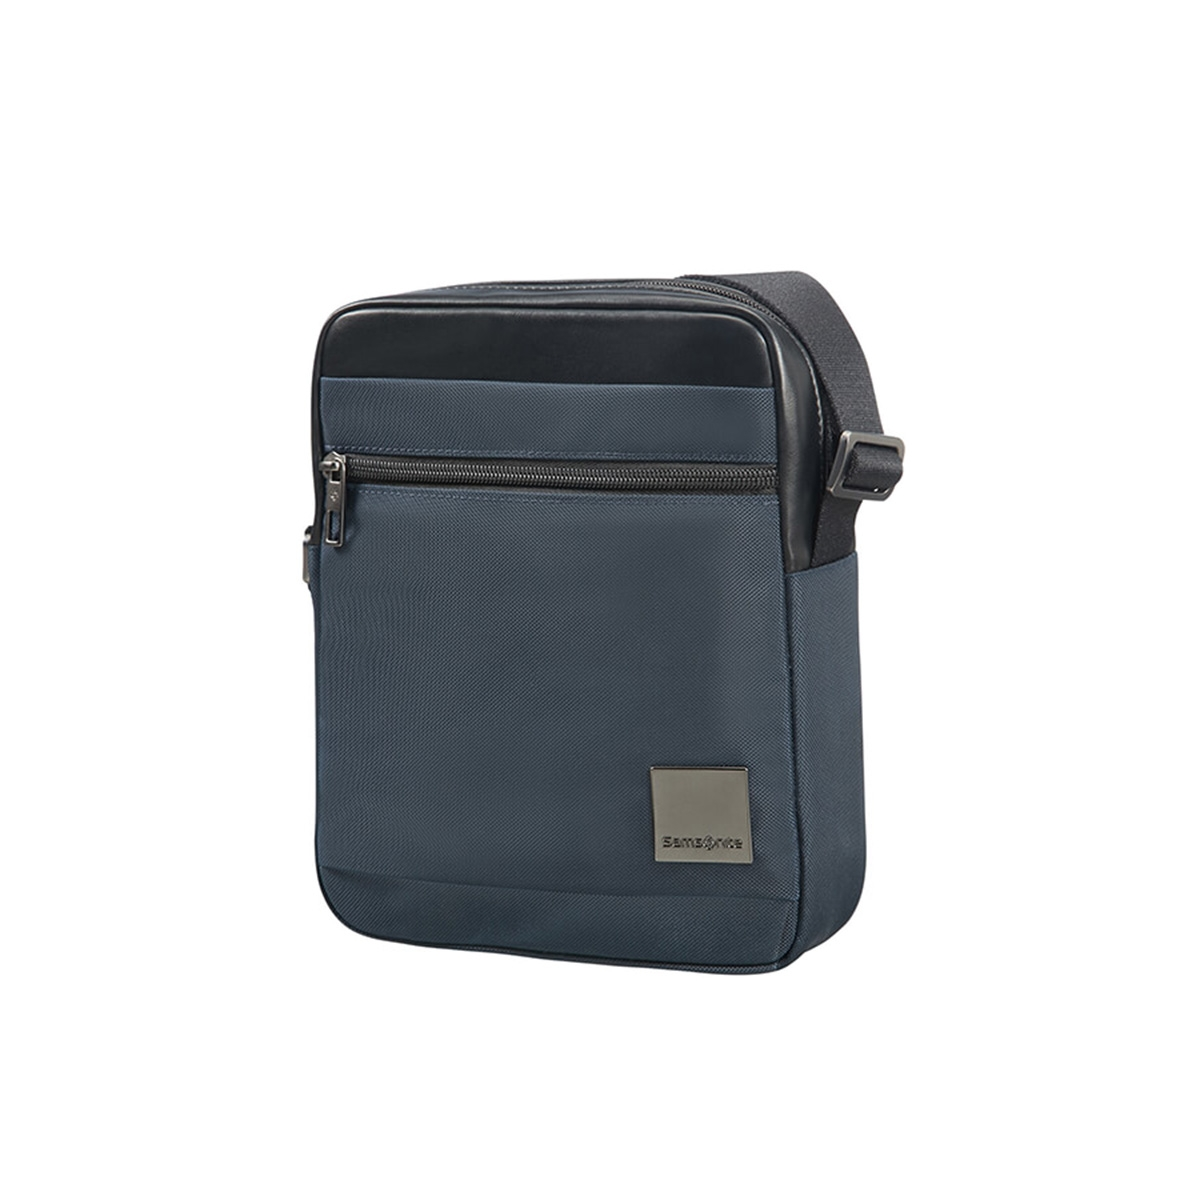 SAMSONITE 92907 Μπλε Τσάντα Ώμου-Χιαστί